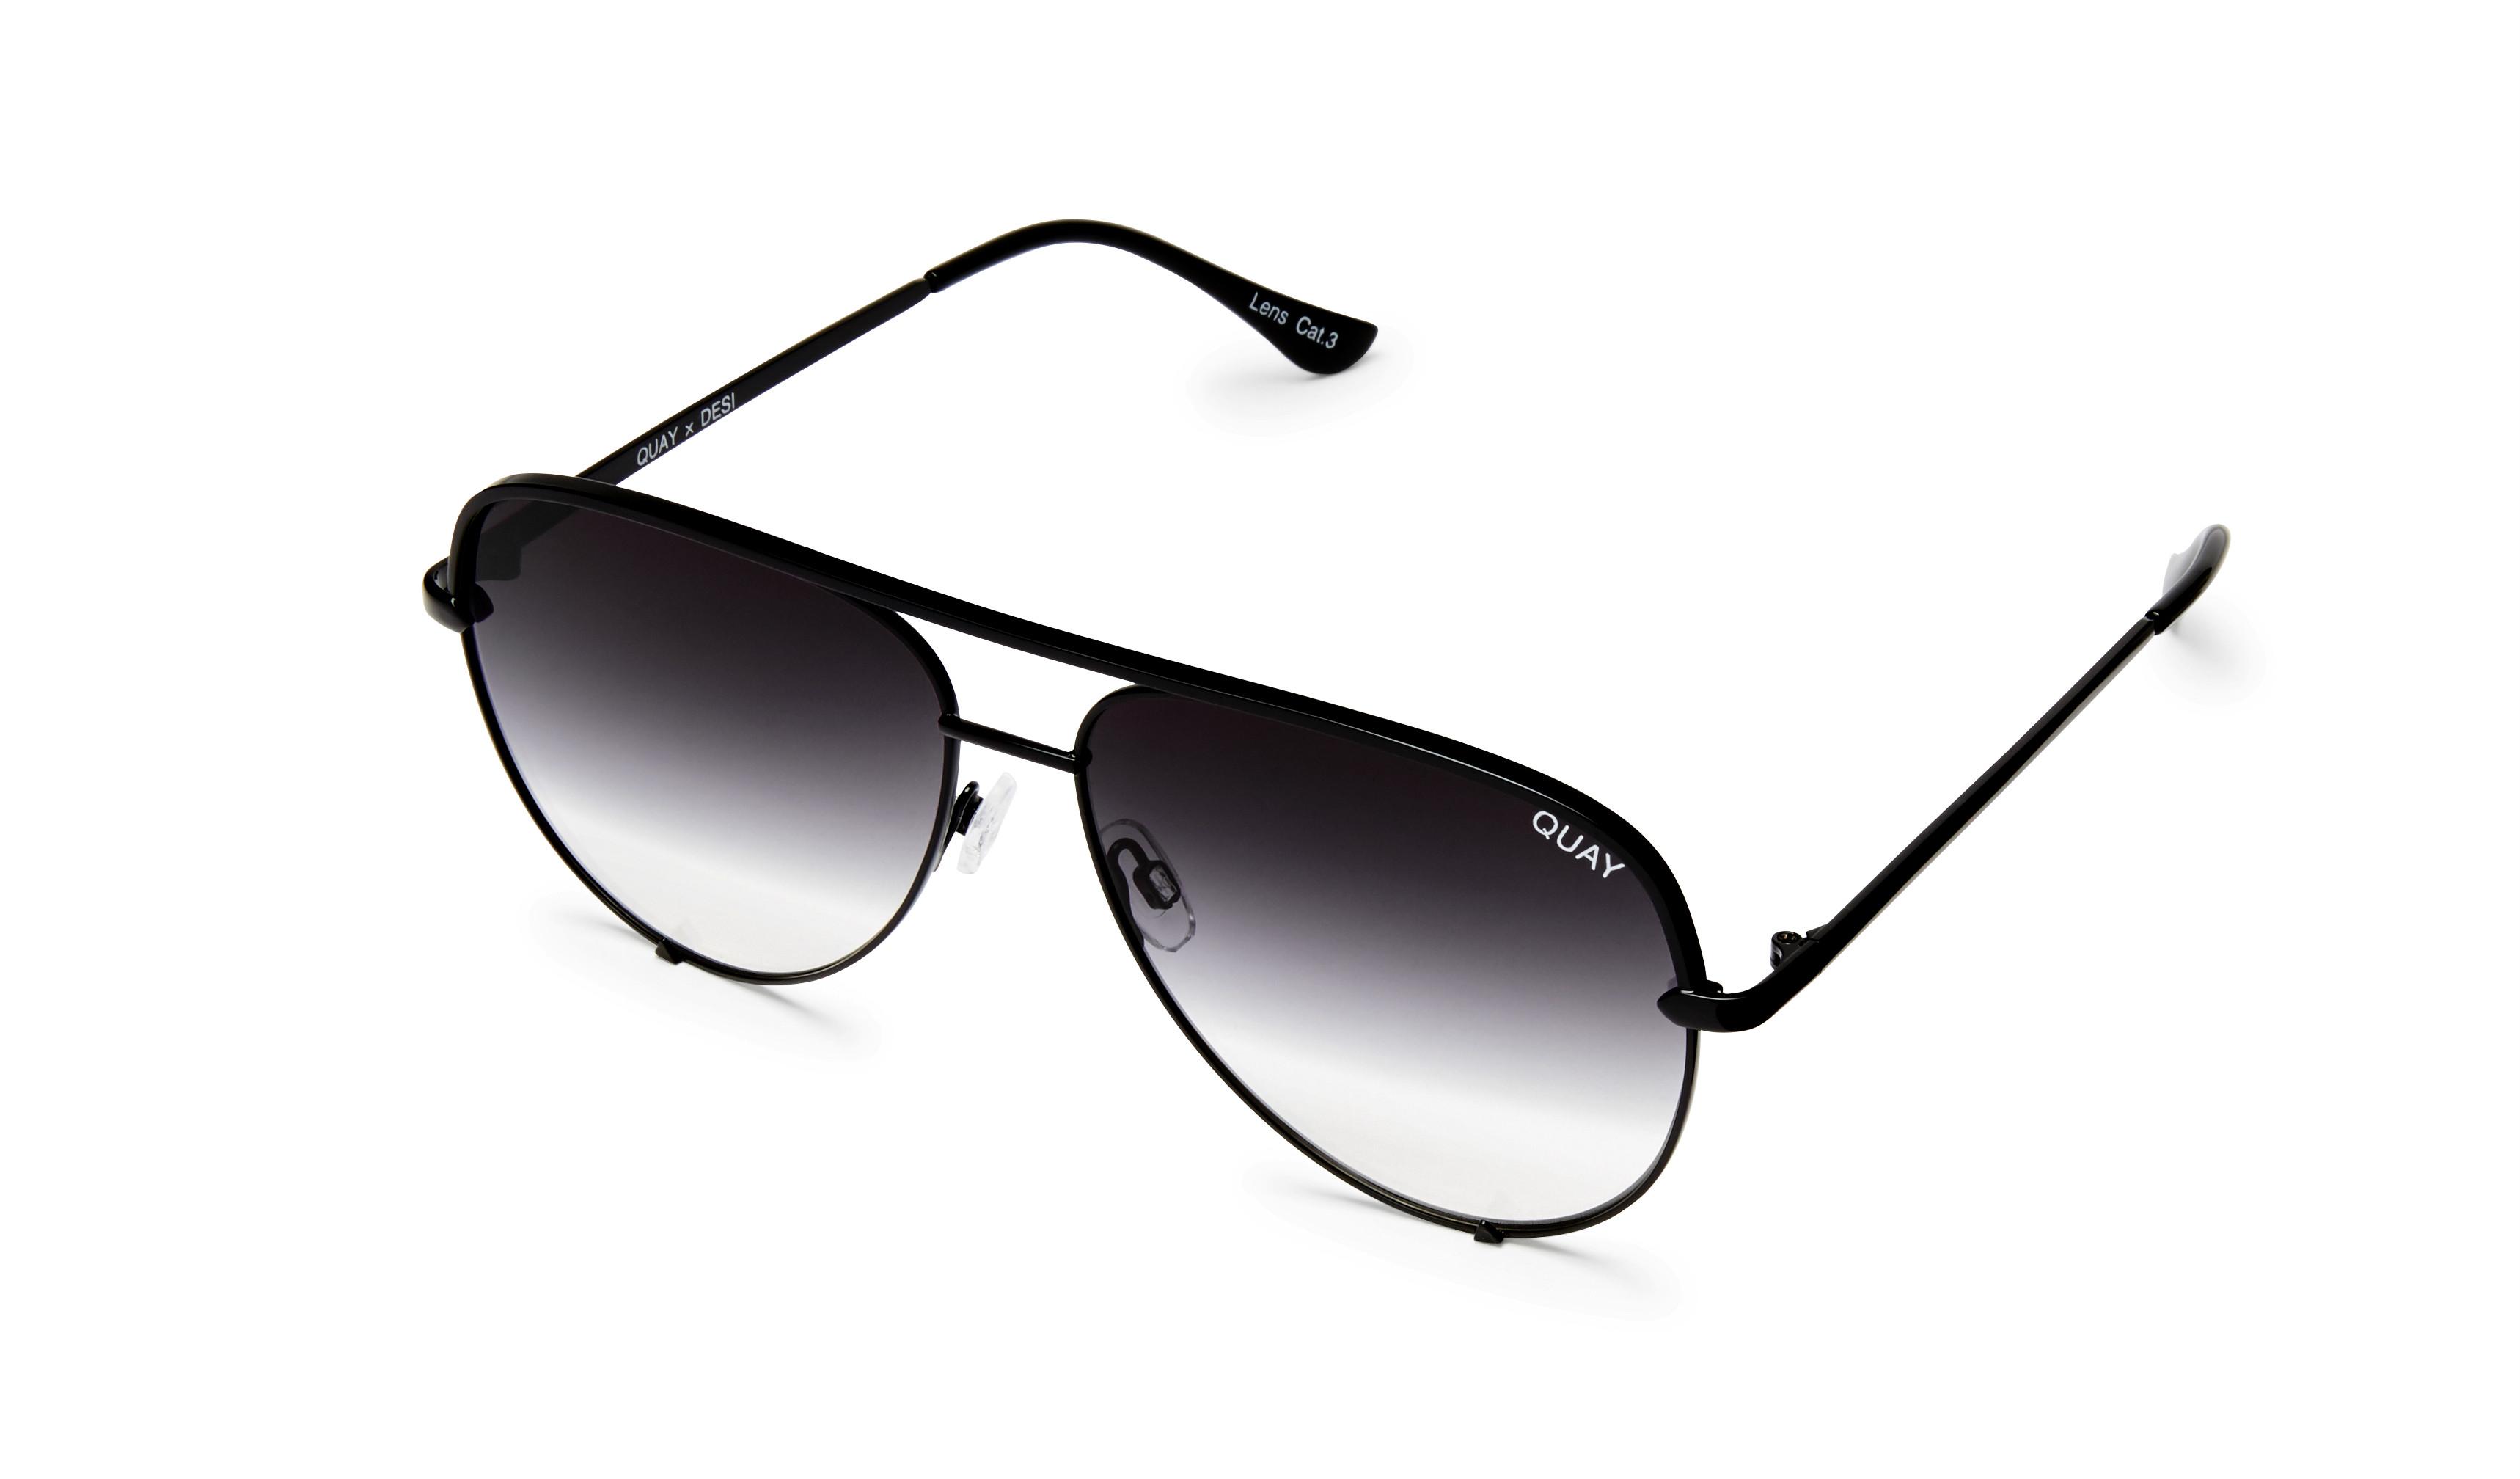 c08aa4e700c3 Sunglasses Brand Quay Australia Throws Shade In Sunny Las Vegas